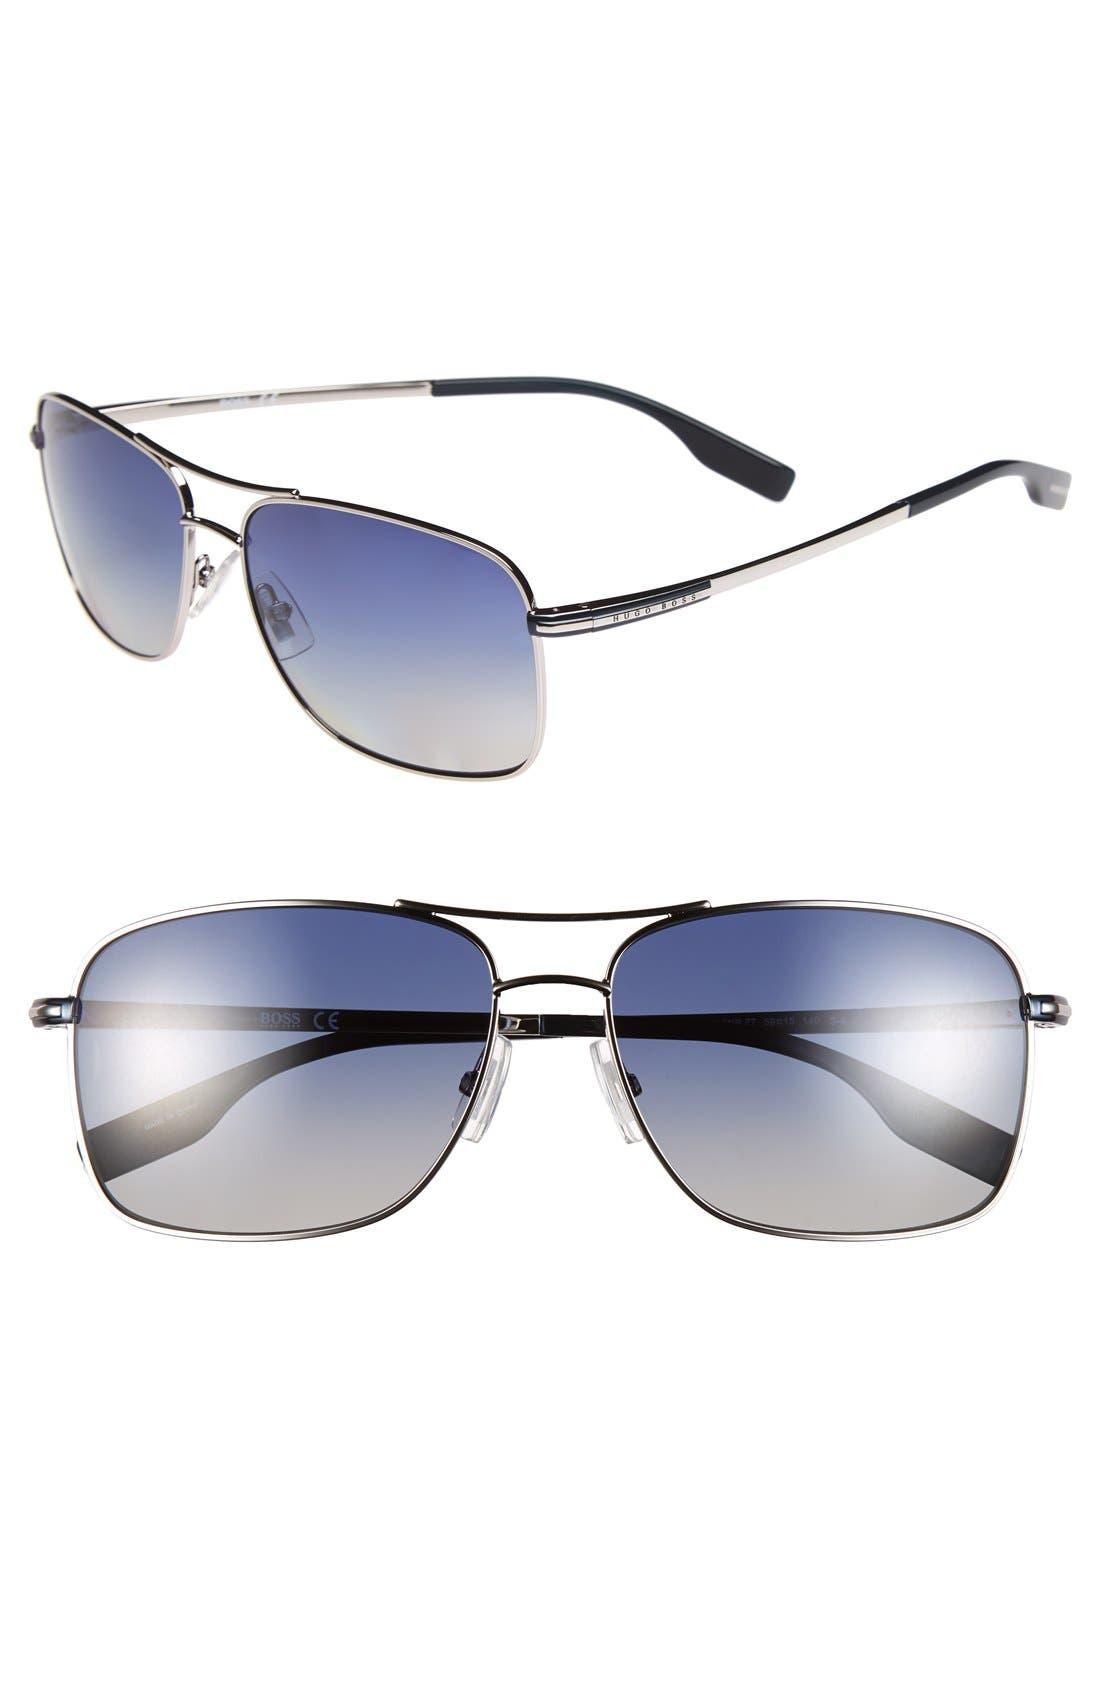 Main Image - BOSS 59mm Polarized Navigator Sunglasses